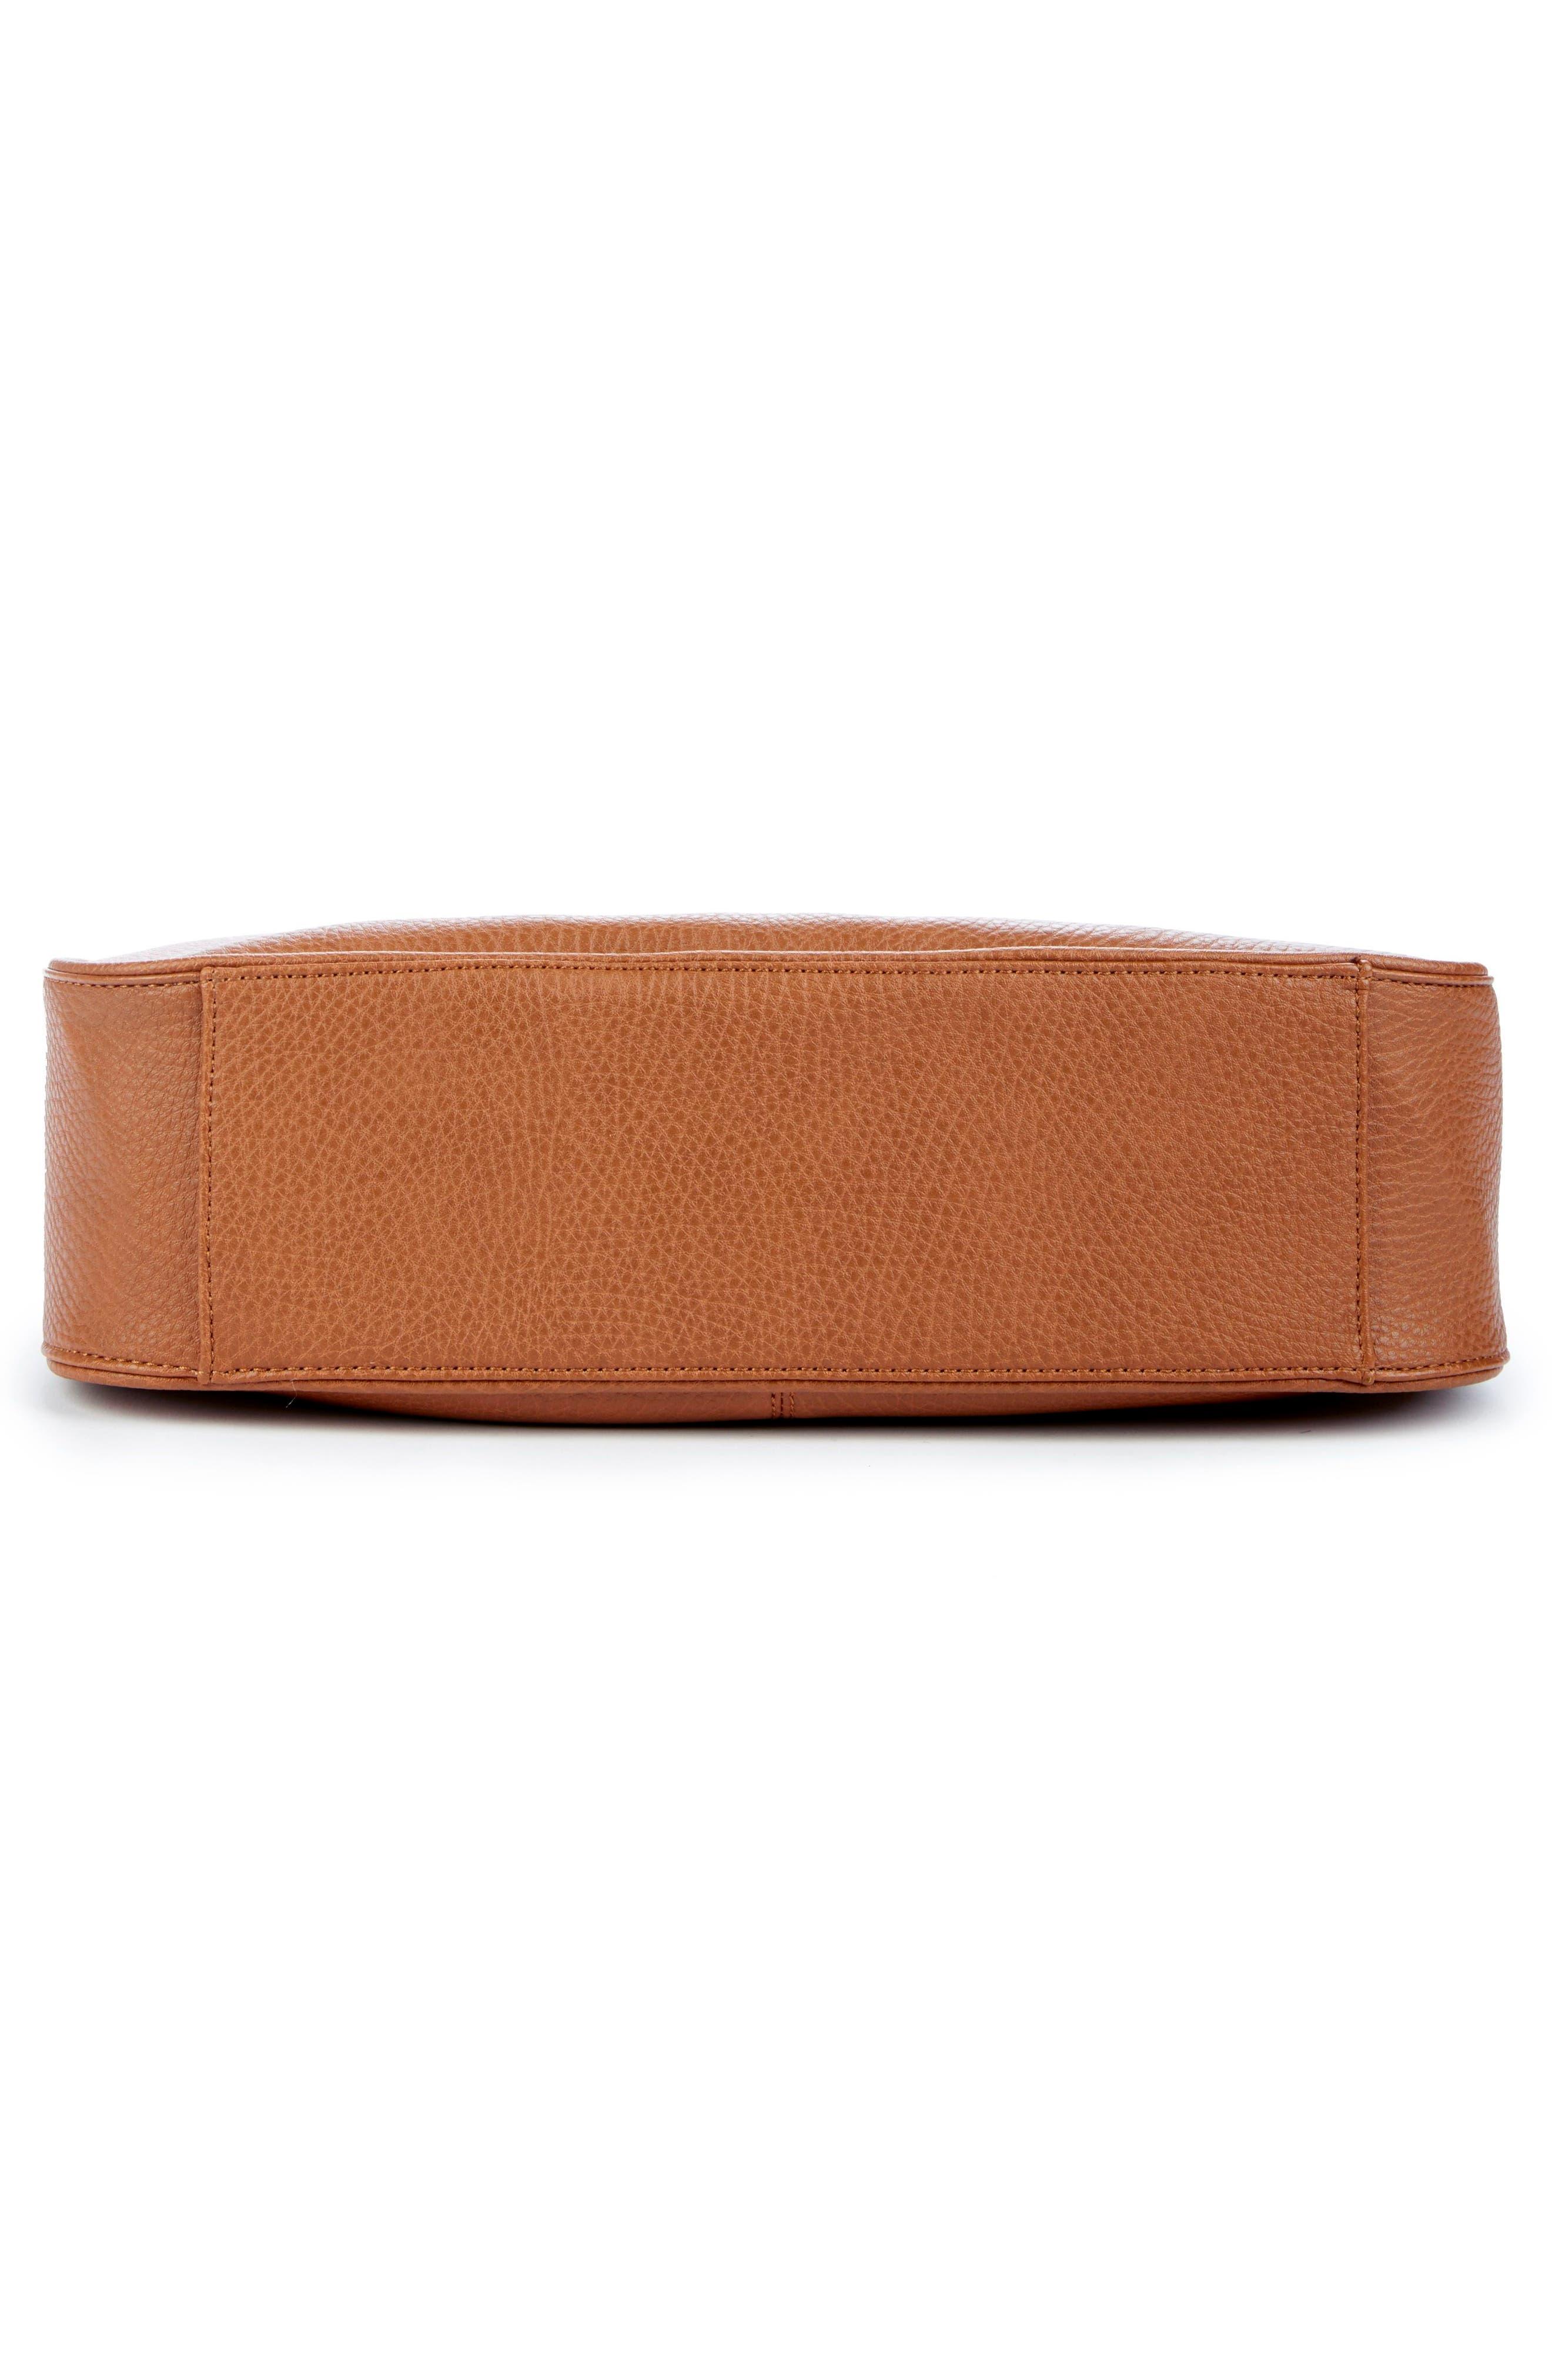 Sarafina Faux Leather Shoulder Bag,                             Alternate thumbnail 5, color,                             Cognac